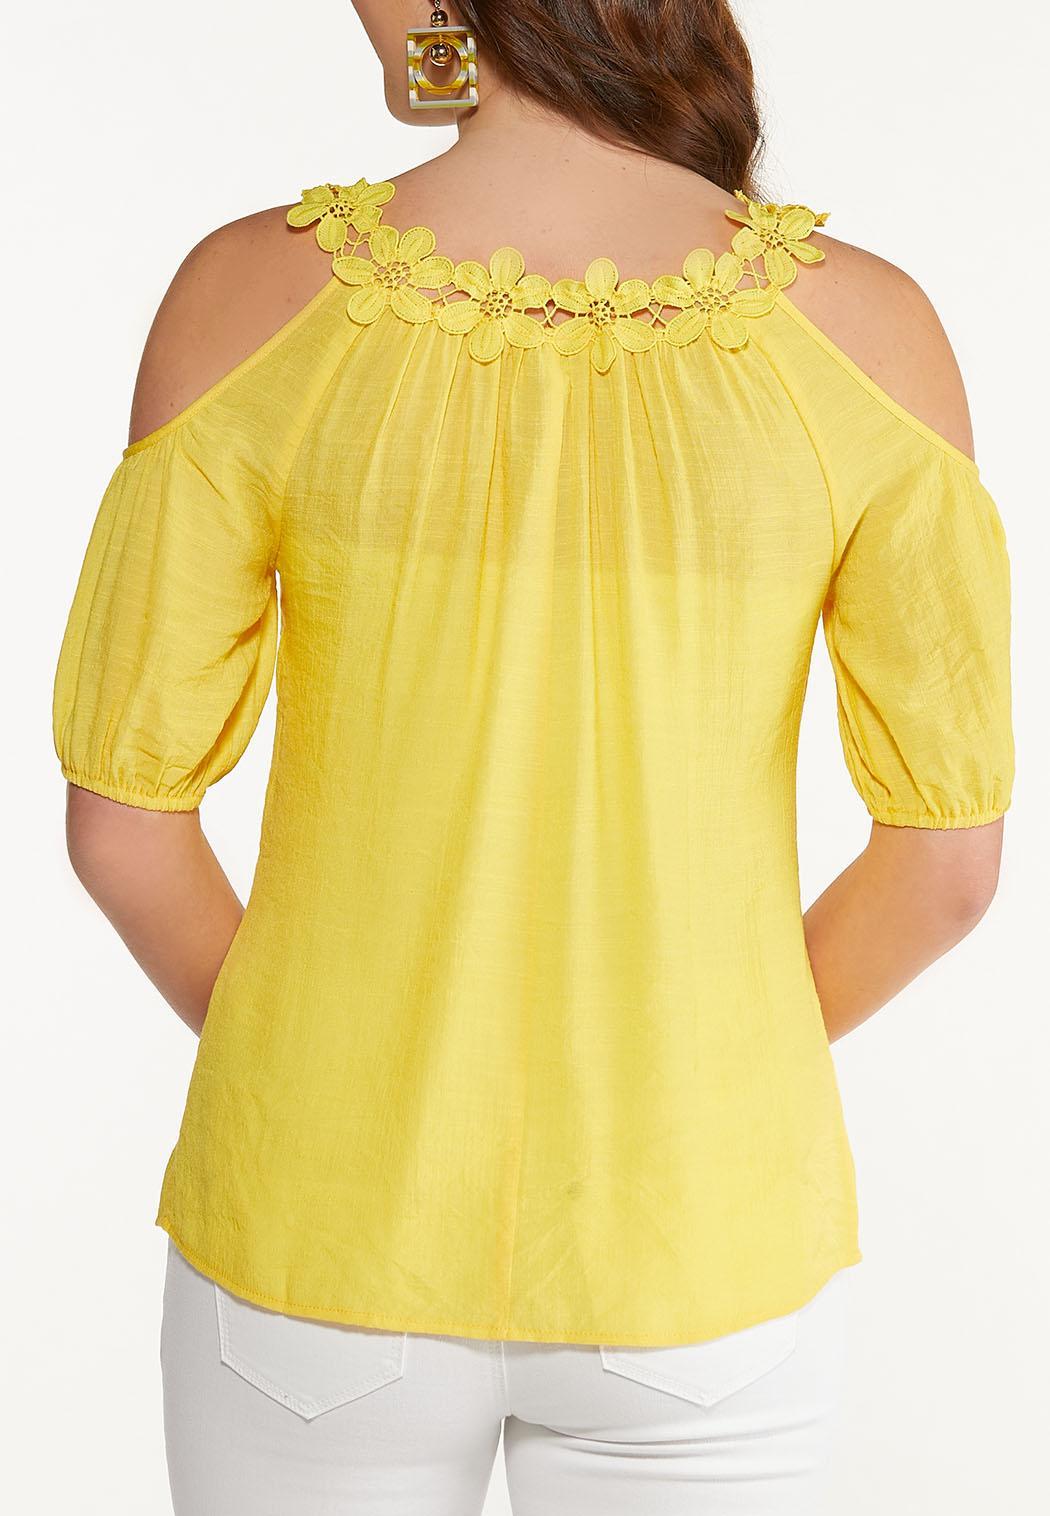 Floral Lace Cold Shoulder Top (Item #44530351)